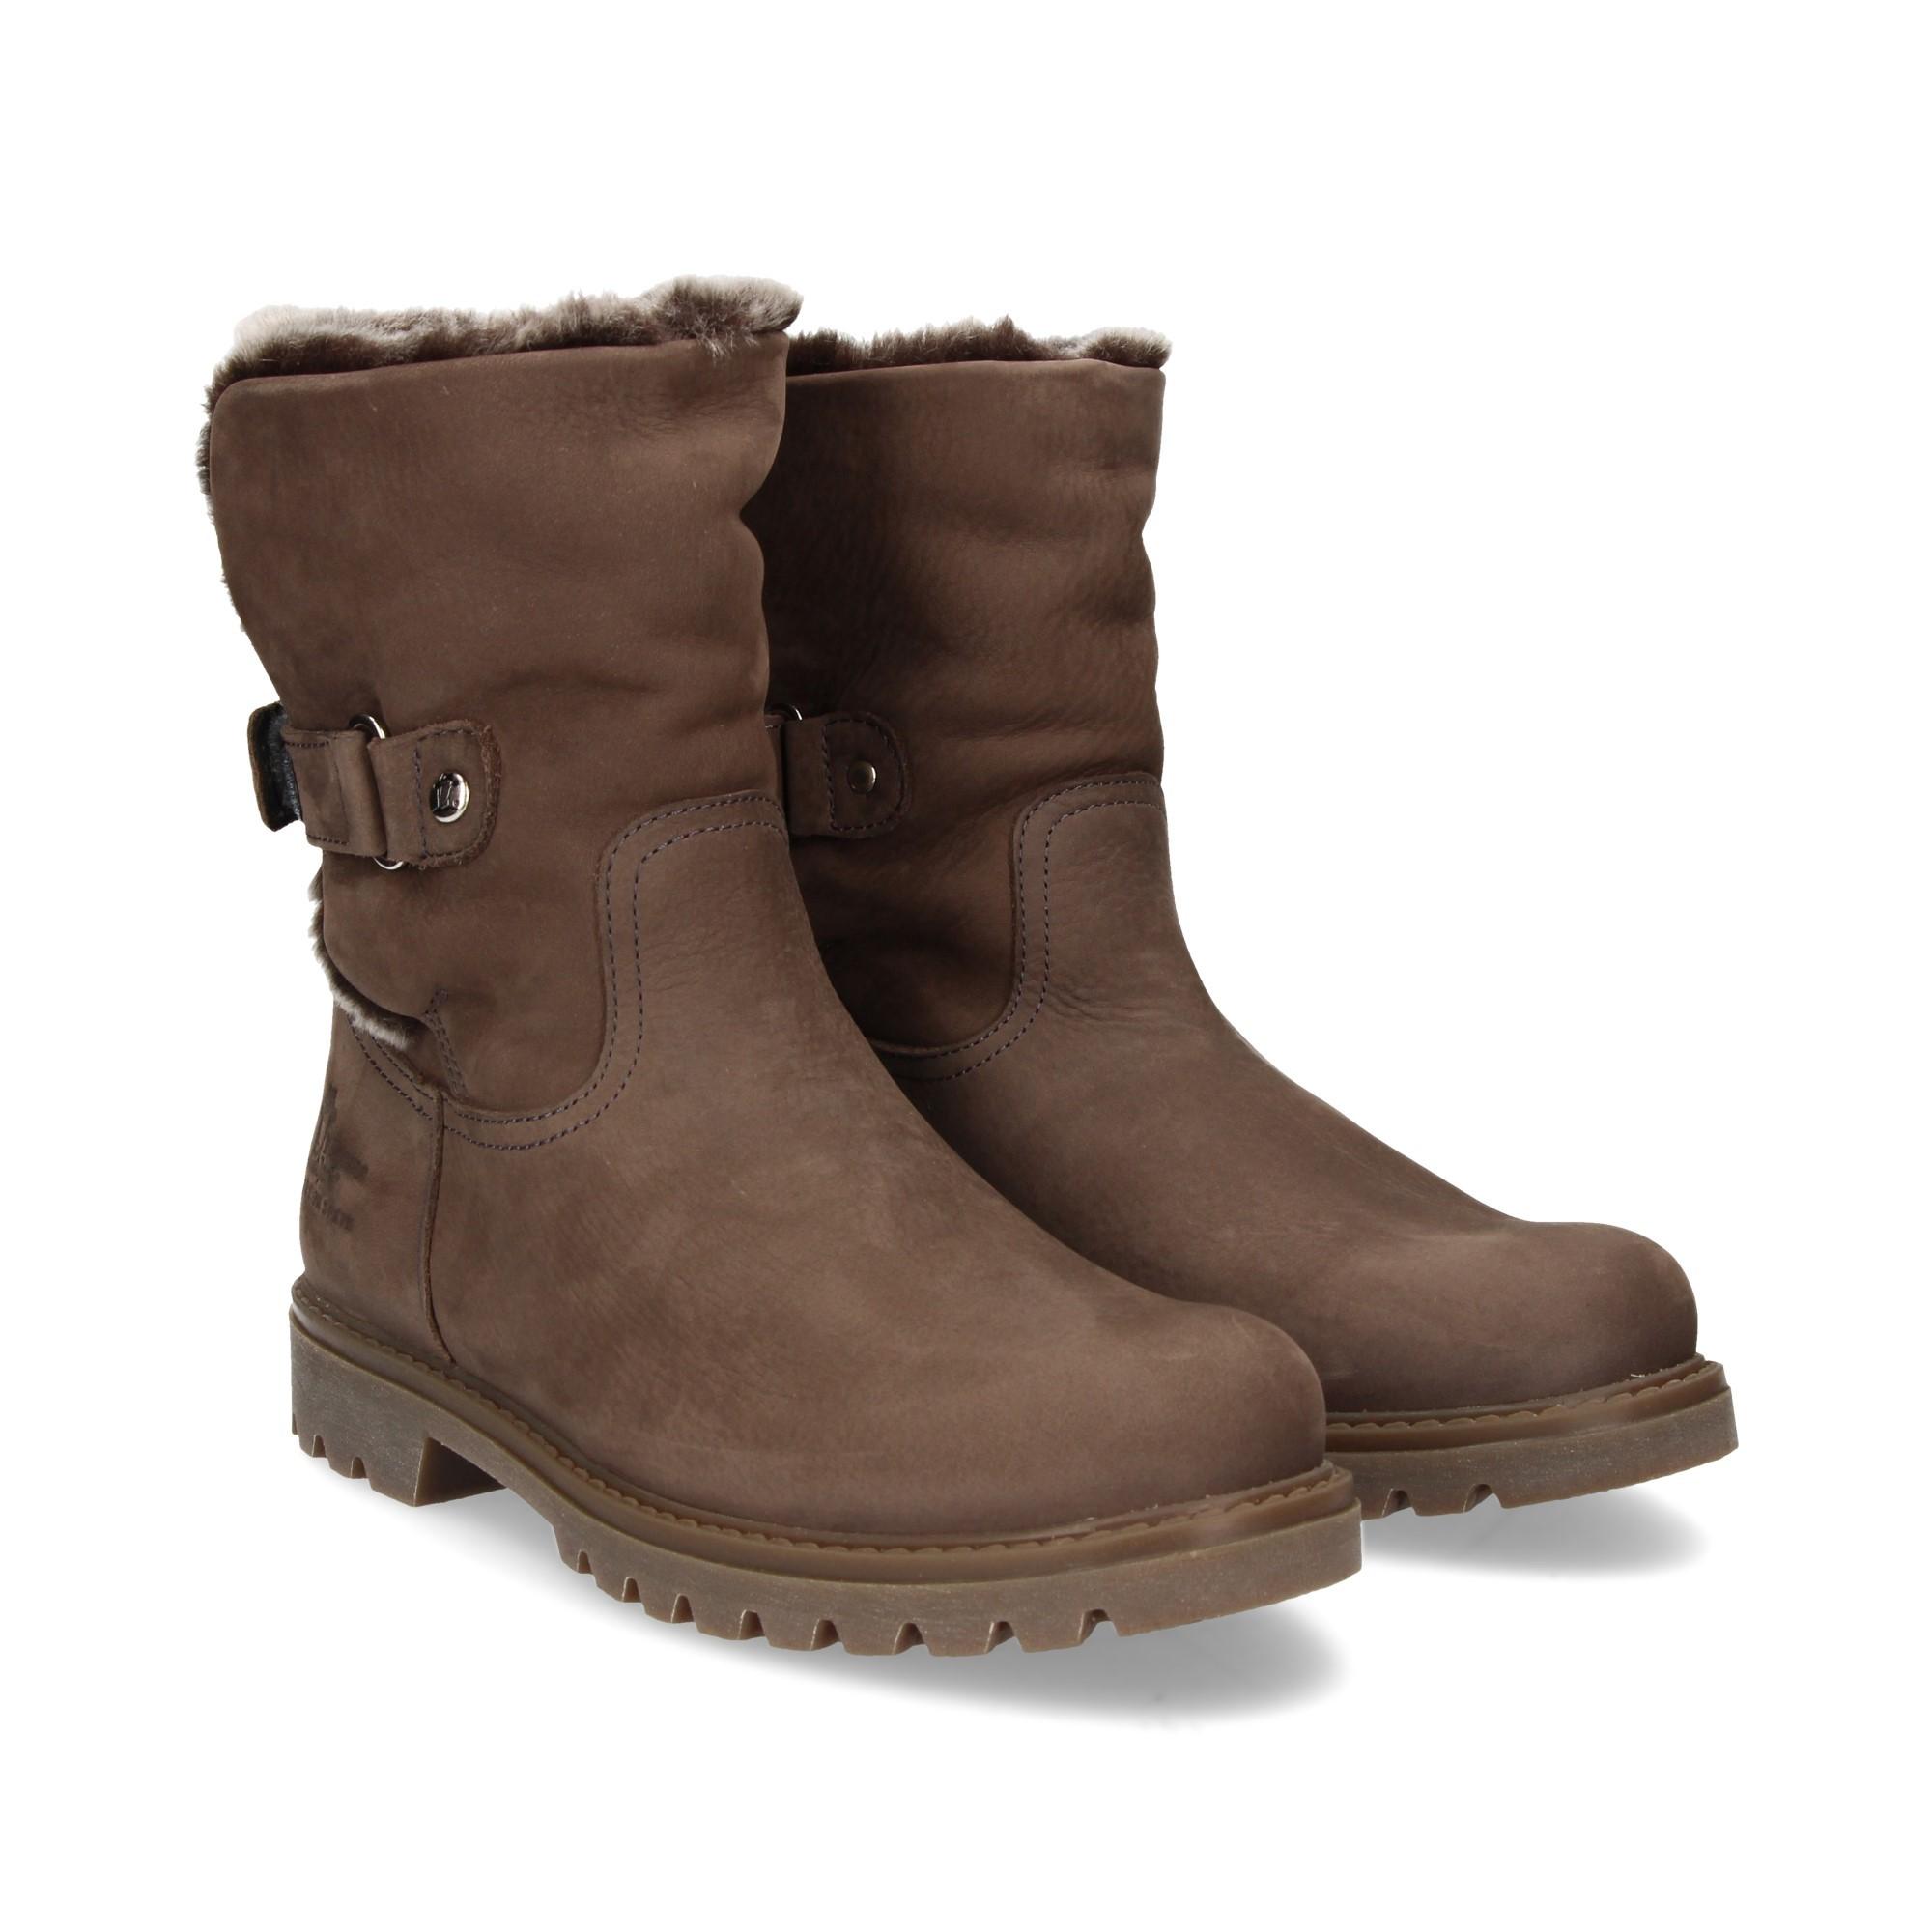 c48baf056b5 PANAMA JACK Women s flat ankle boots FELIA B44 NOBUCK GRIS